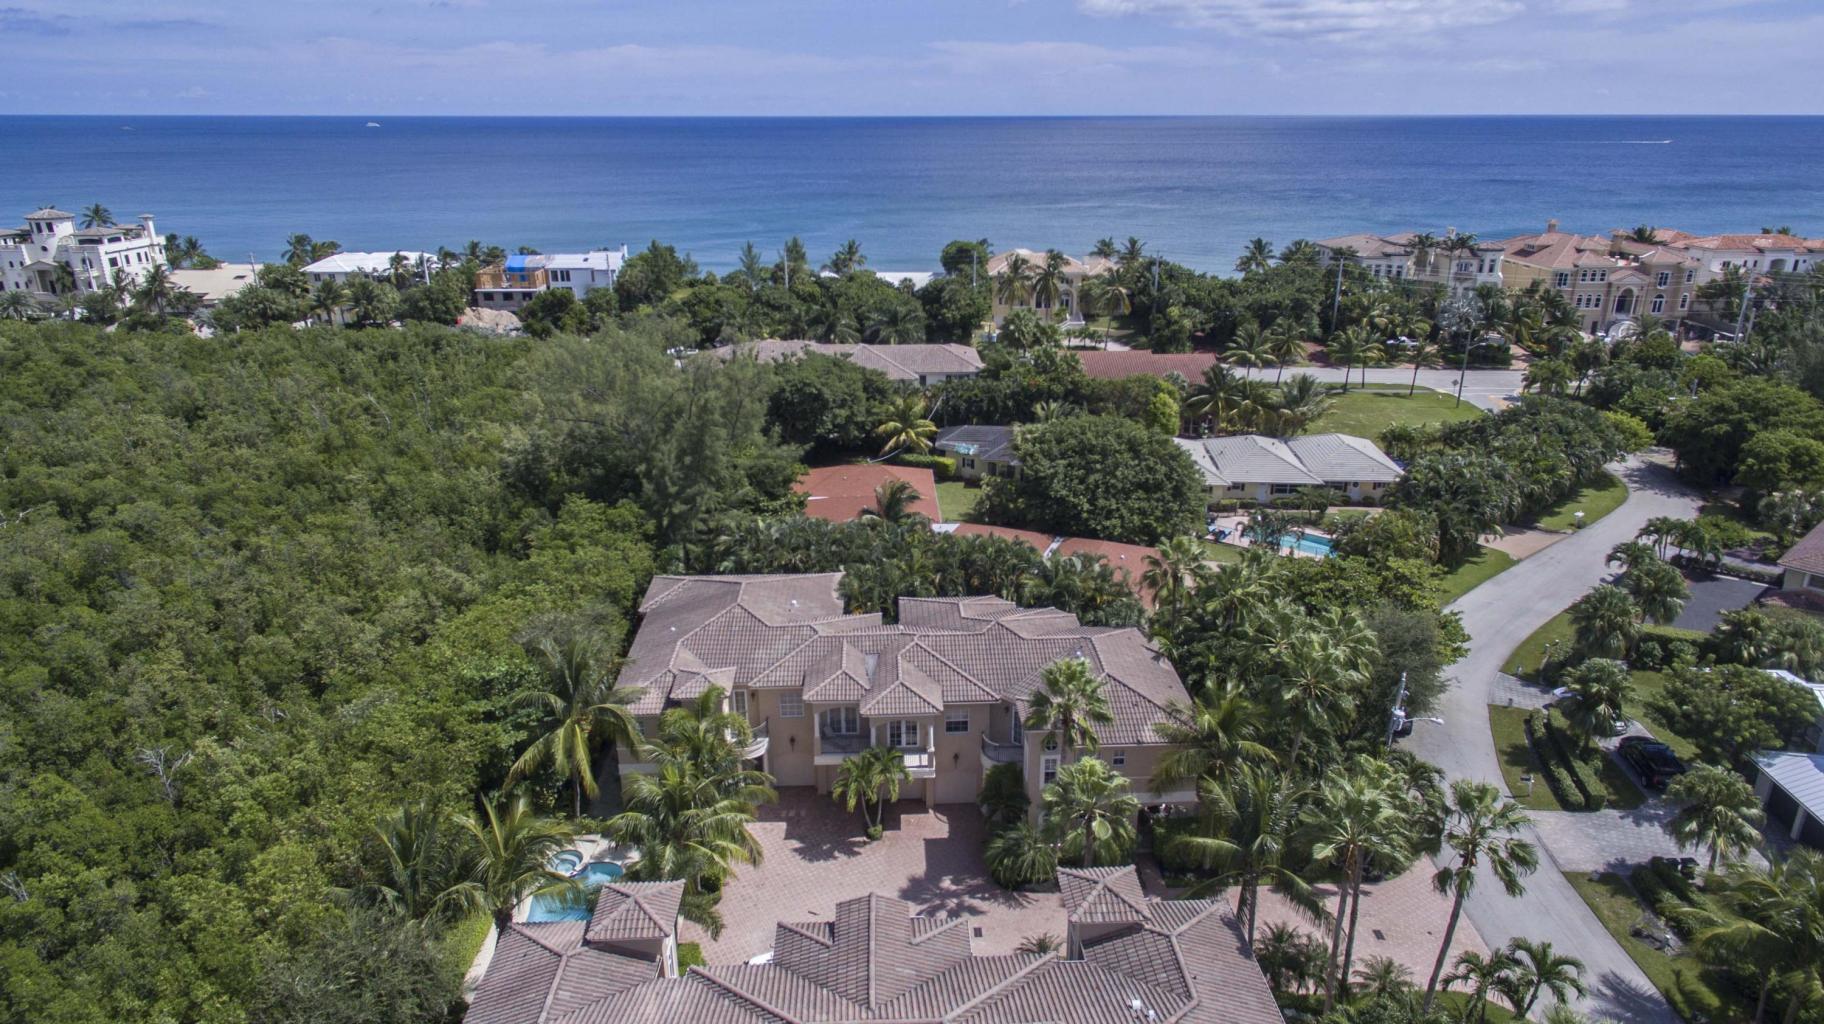 Bel Lido Highland Beach Home for Sale